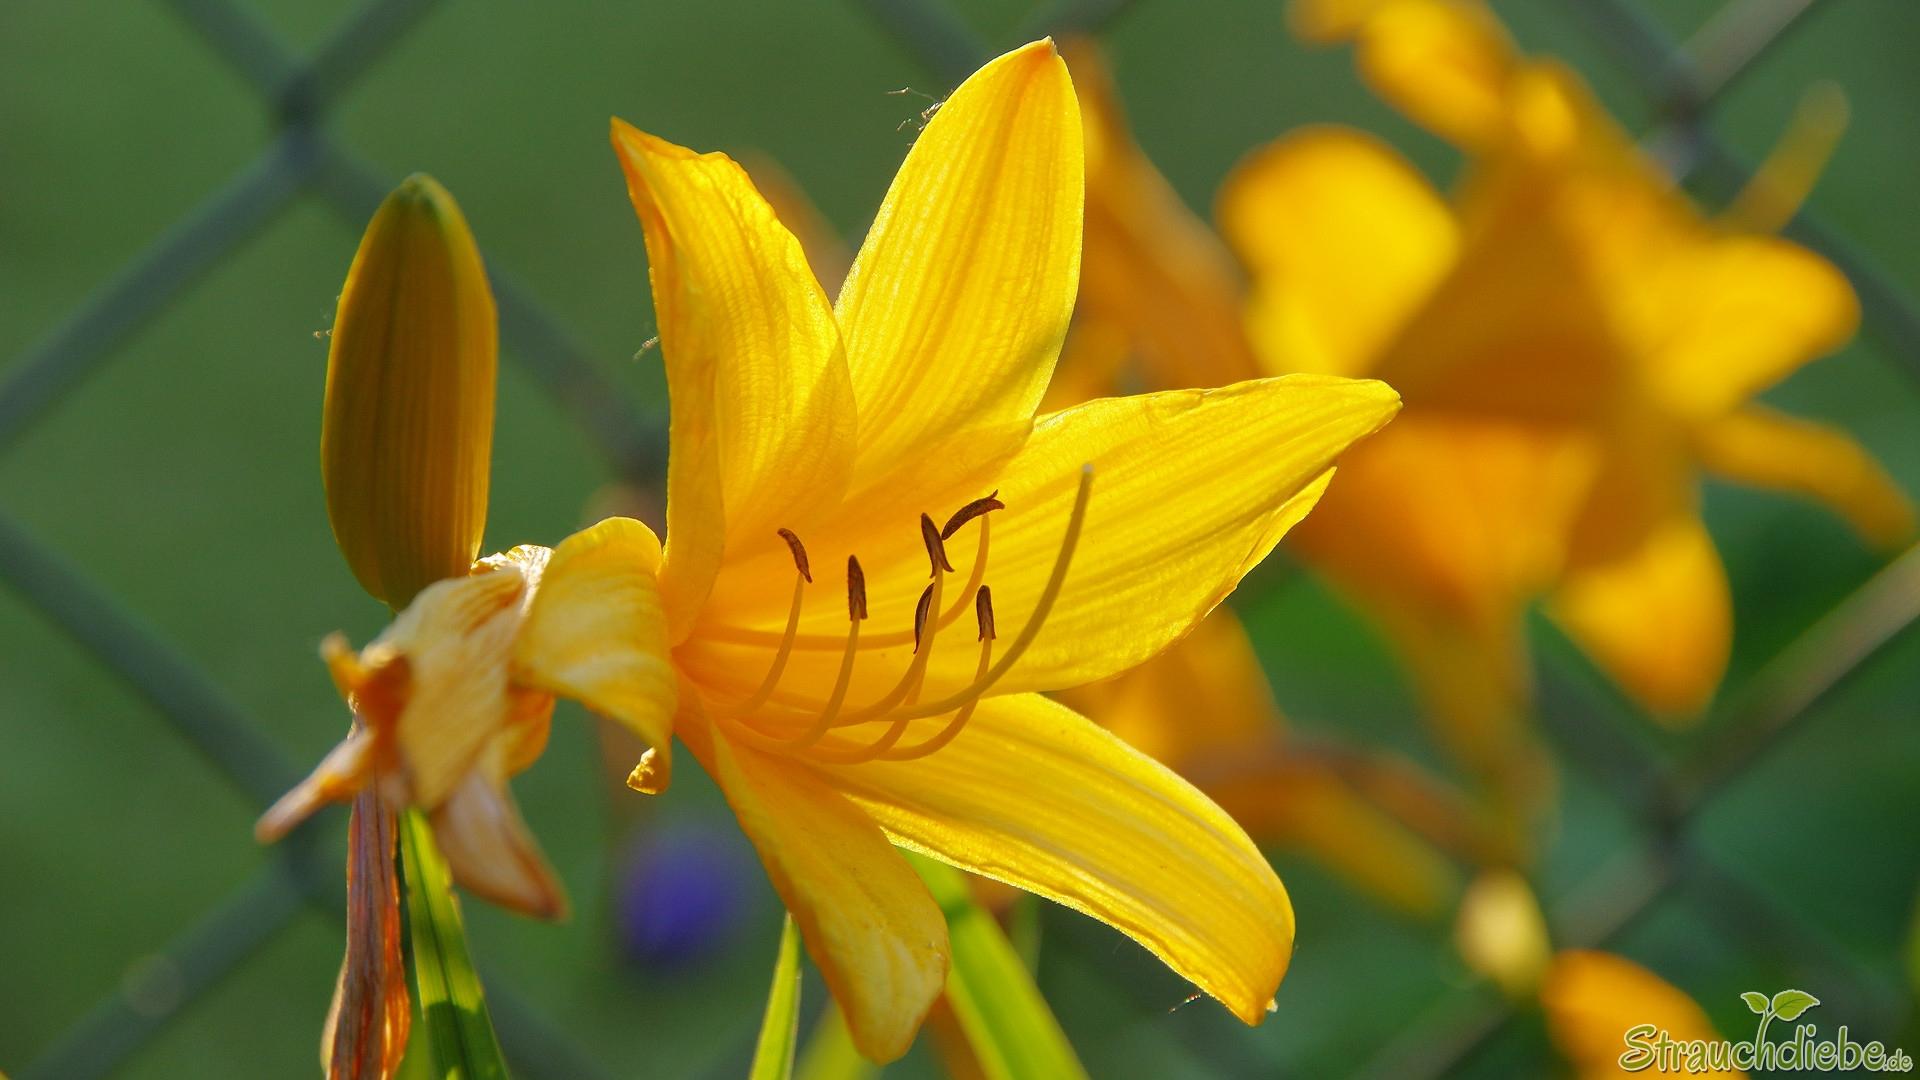 Gelbe Taglilie (Hemerocallis lilioasphodelus)